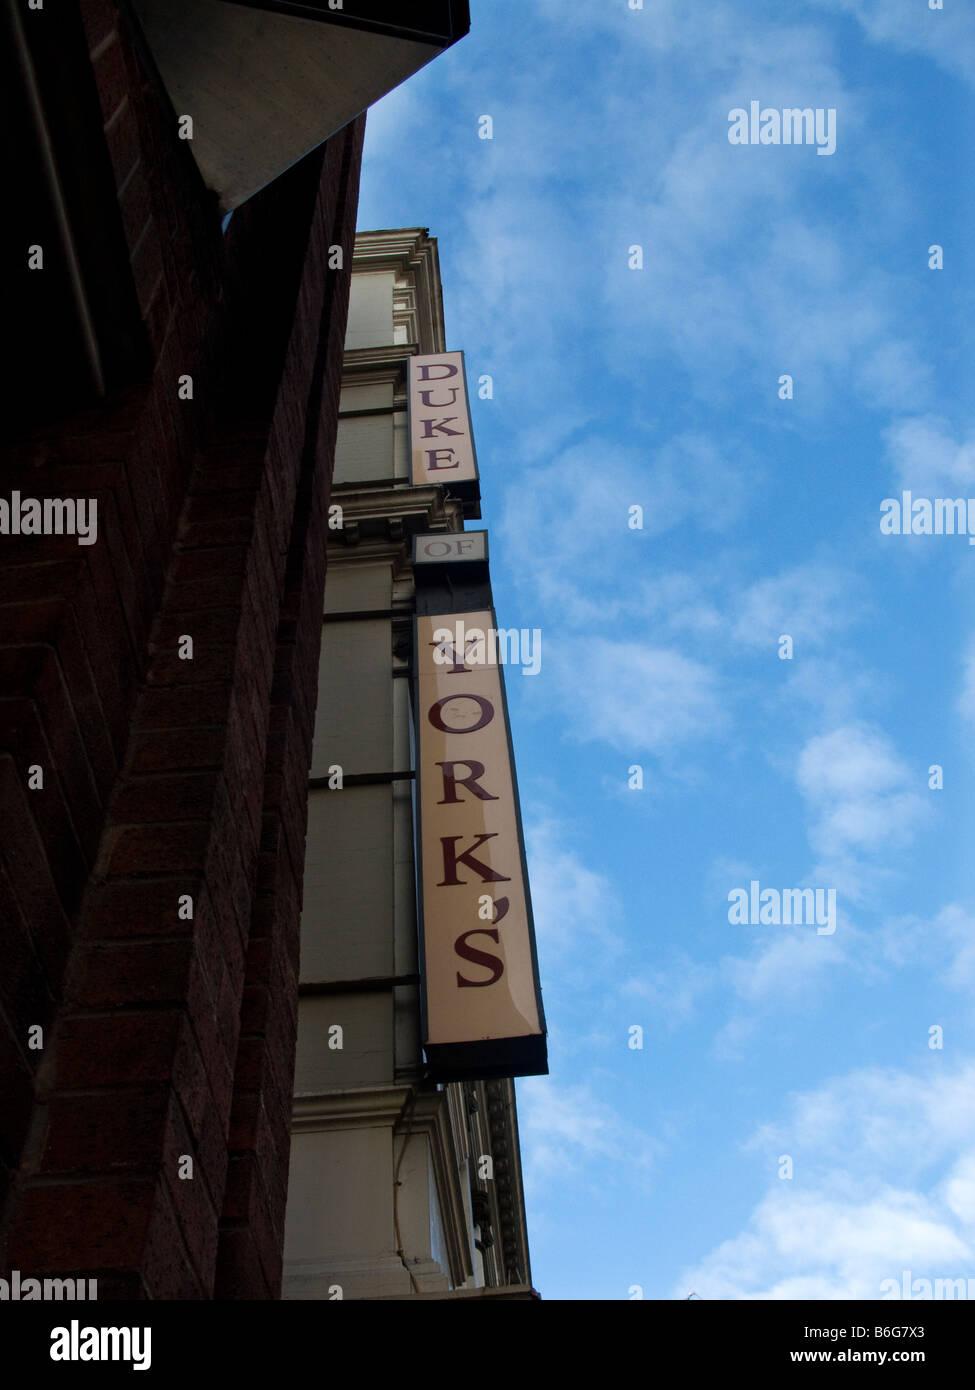 Duke of York Theatre, St Martin's Lane, London, WC2. - Stock Image